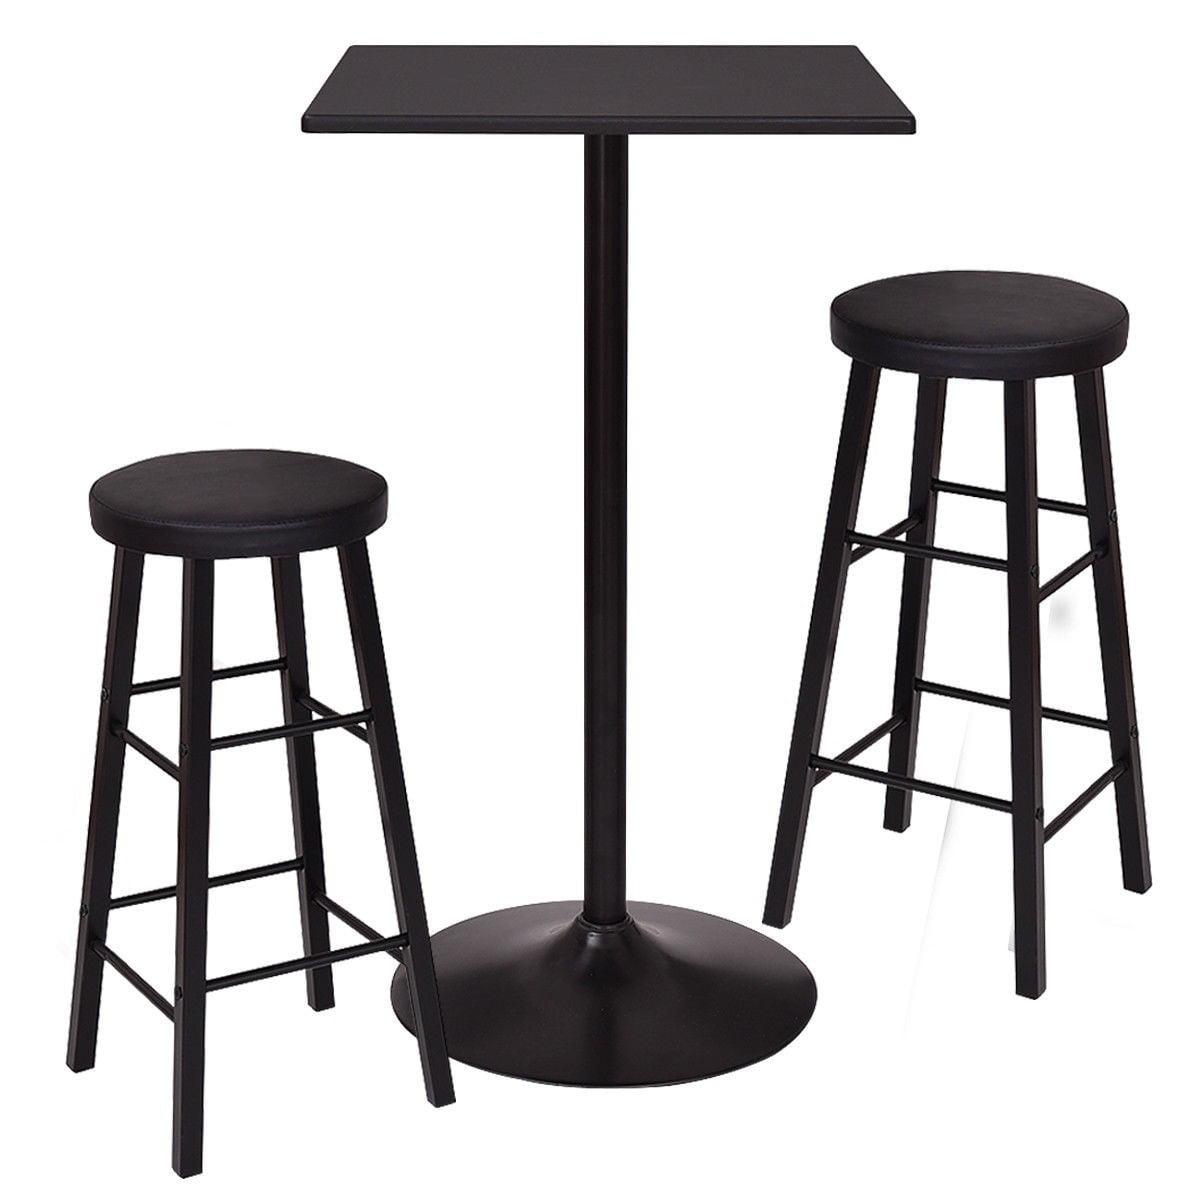 3 pcs Bistro Pub Square Pub Table & Stools Set by